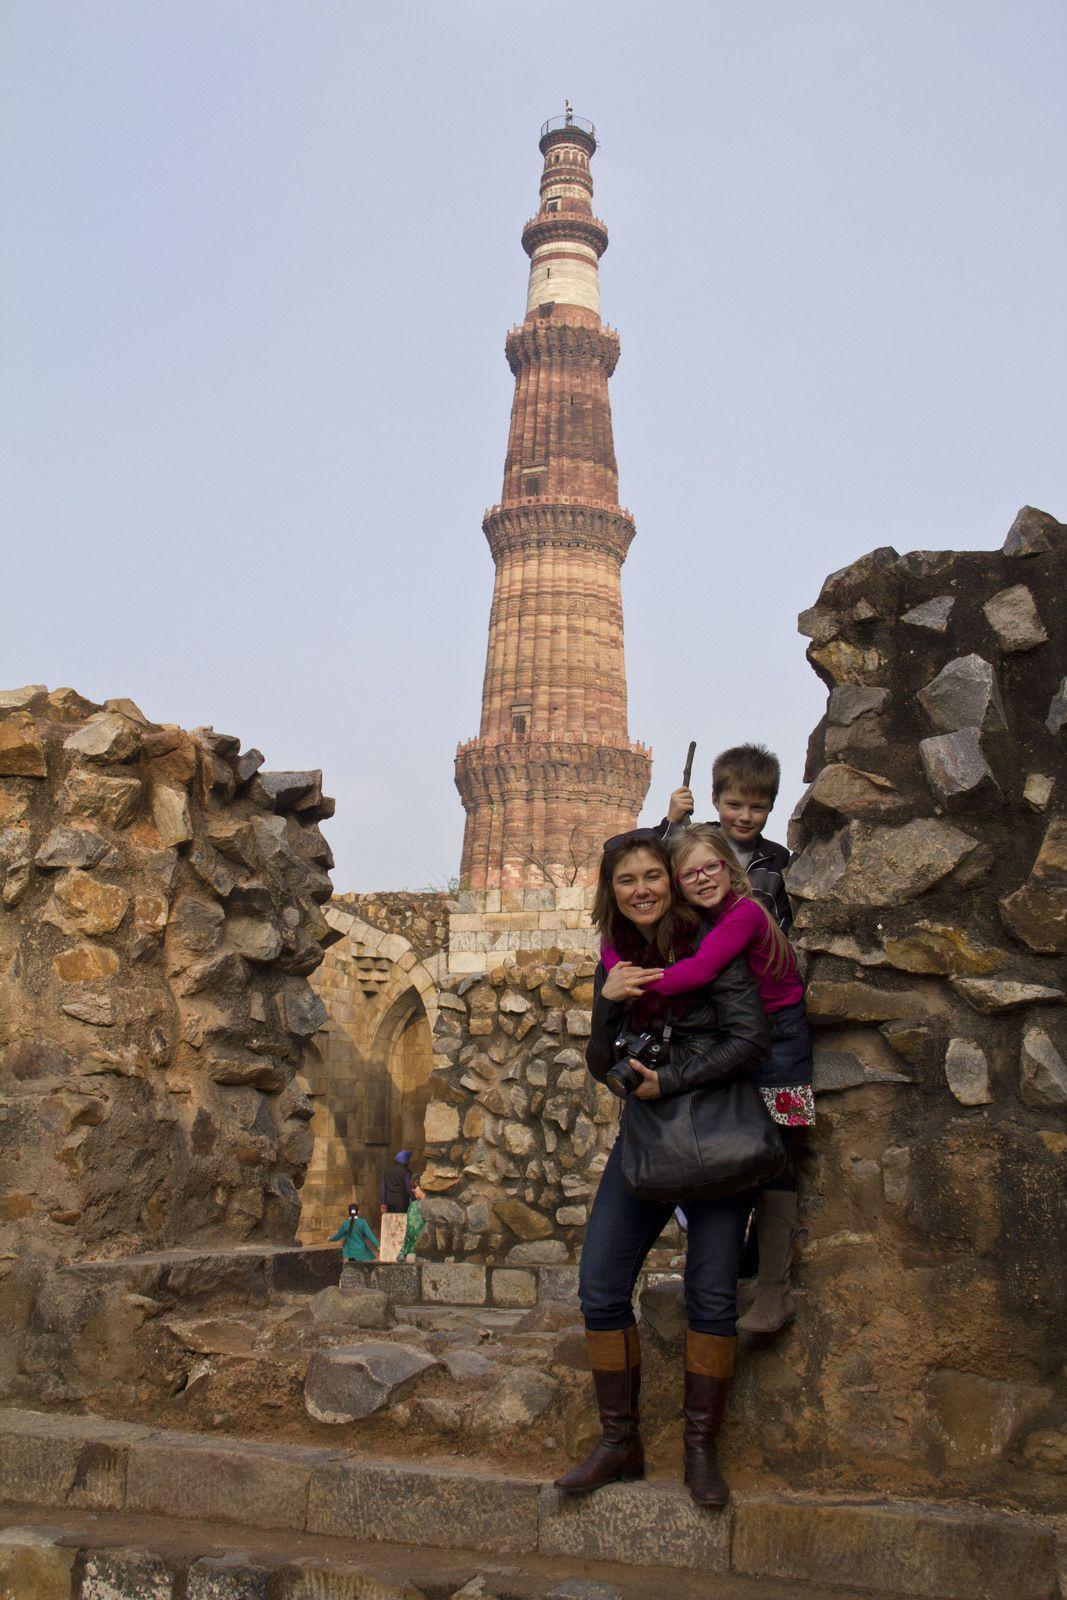 A Dehli : Visite d'Humayum's Tomb avec Sandrine puis Qutb Minar avec Sandrine, Elodie et Thomas